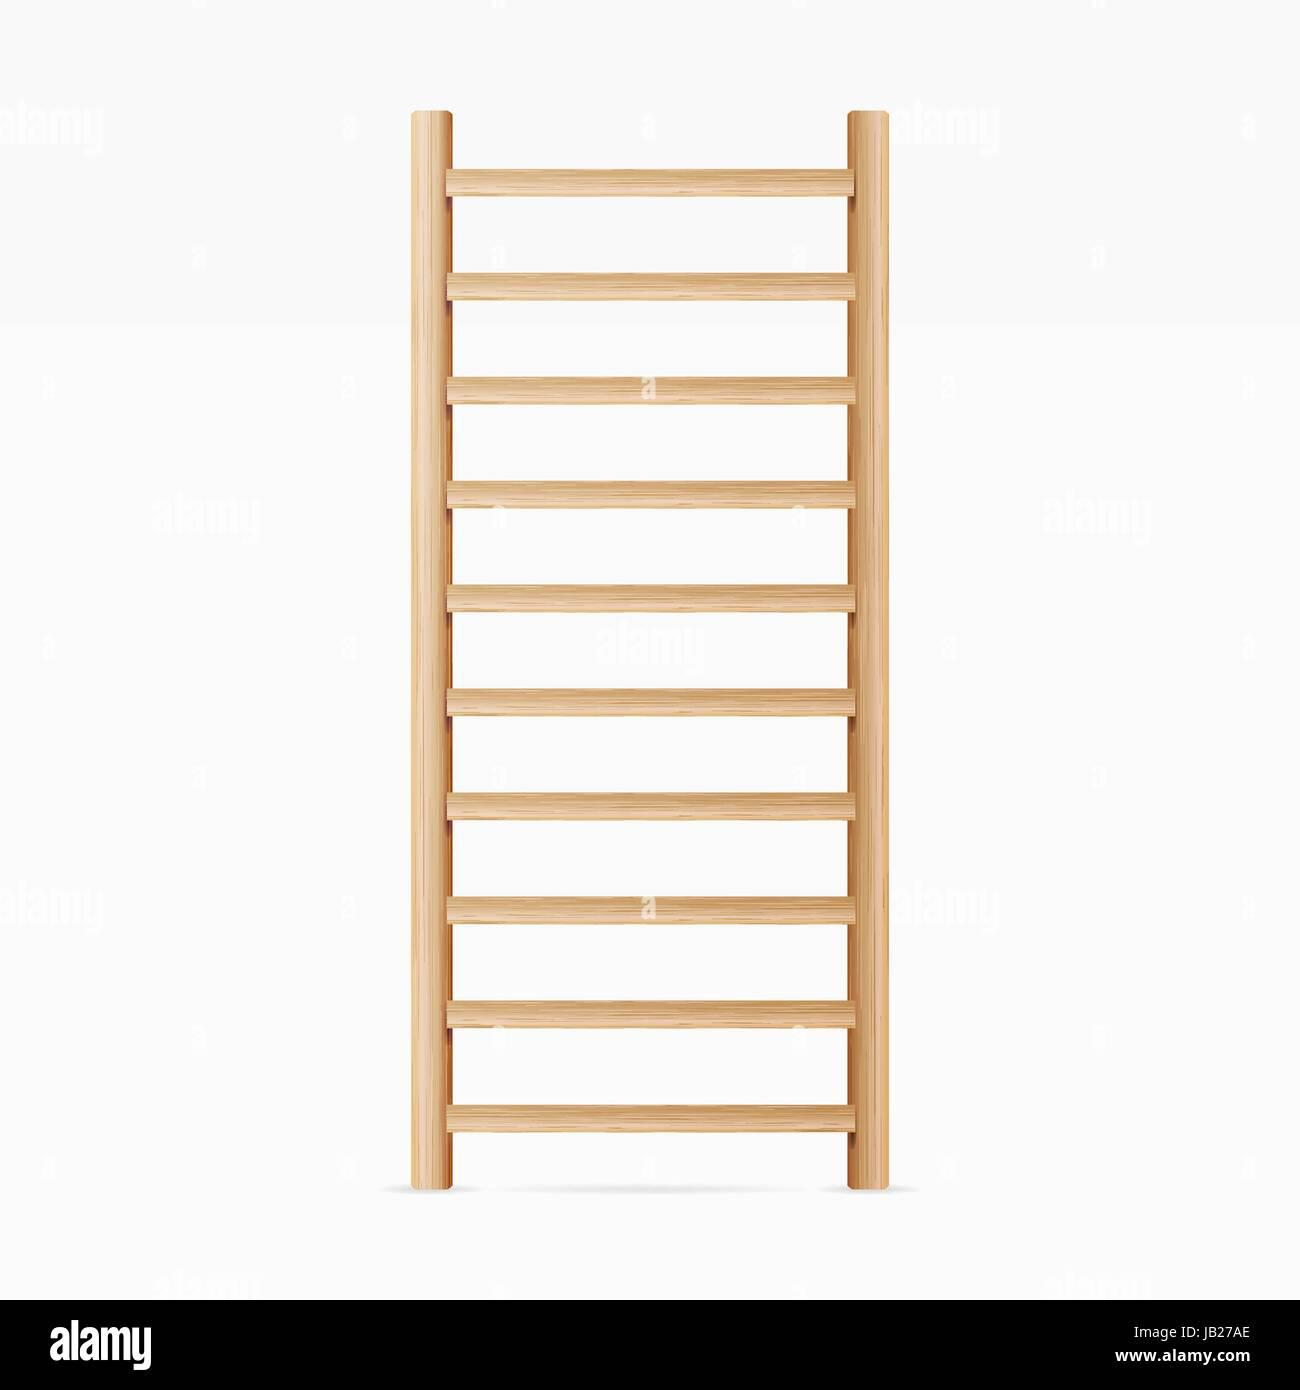 Gymnastics Wall Bars Ladder. Swedish Staircase Sports Gymnastics Ladder. Gymnastics Wall Gym Tool. Sports Ladder - Stock Image